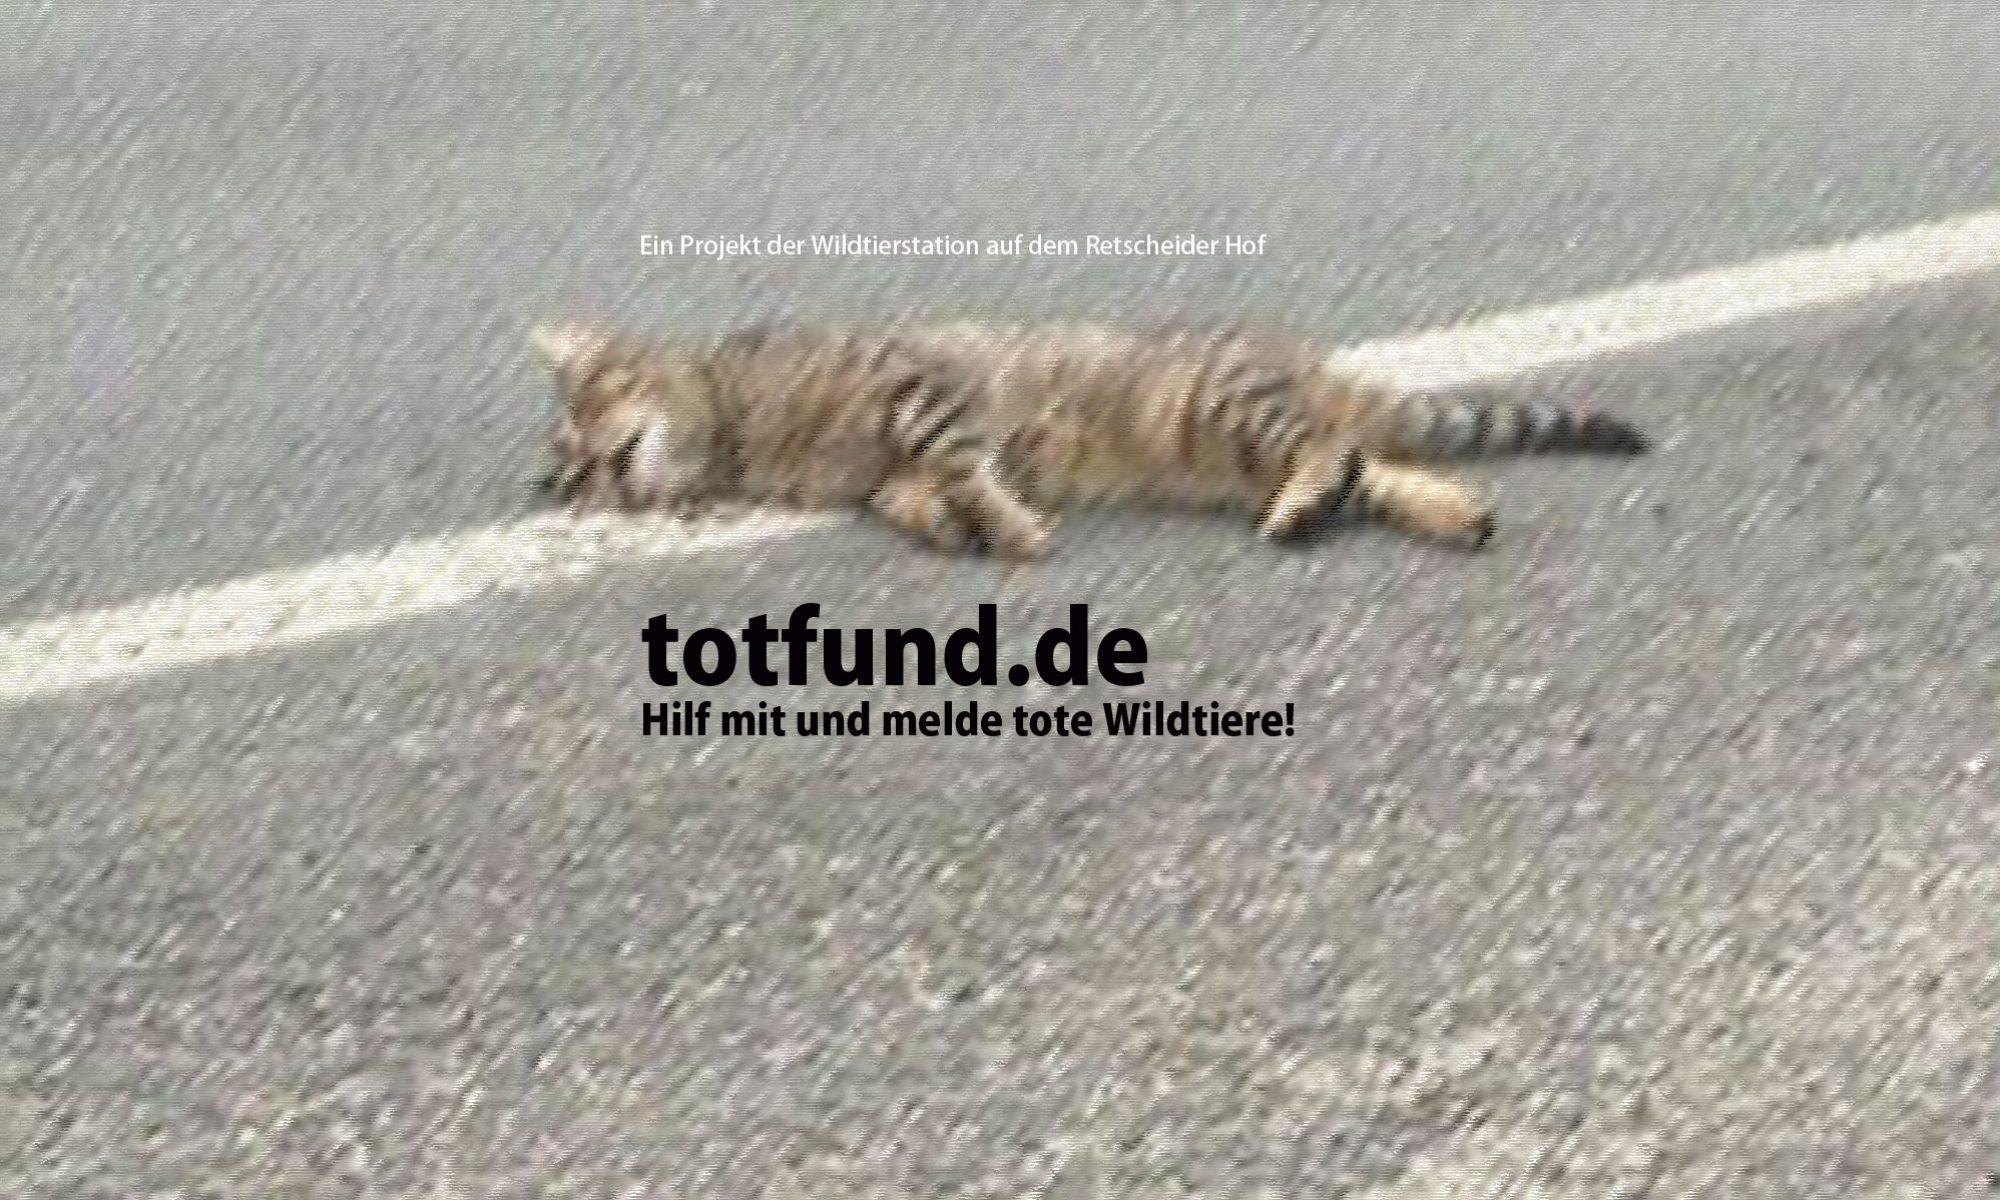 Totfund.de - Melde verstorbene Wildtiere in Deutschland